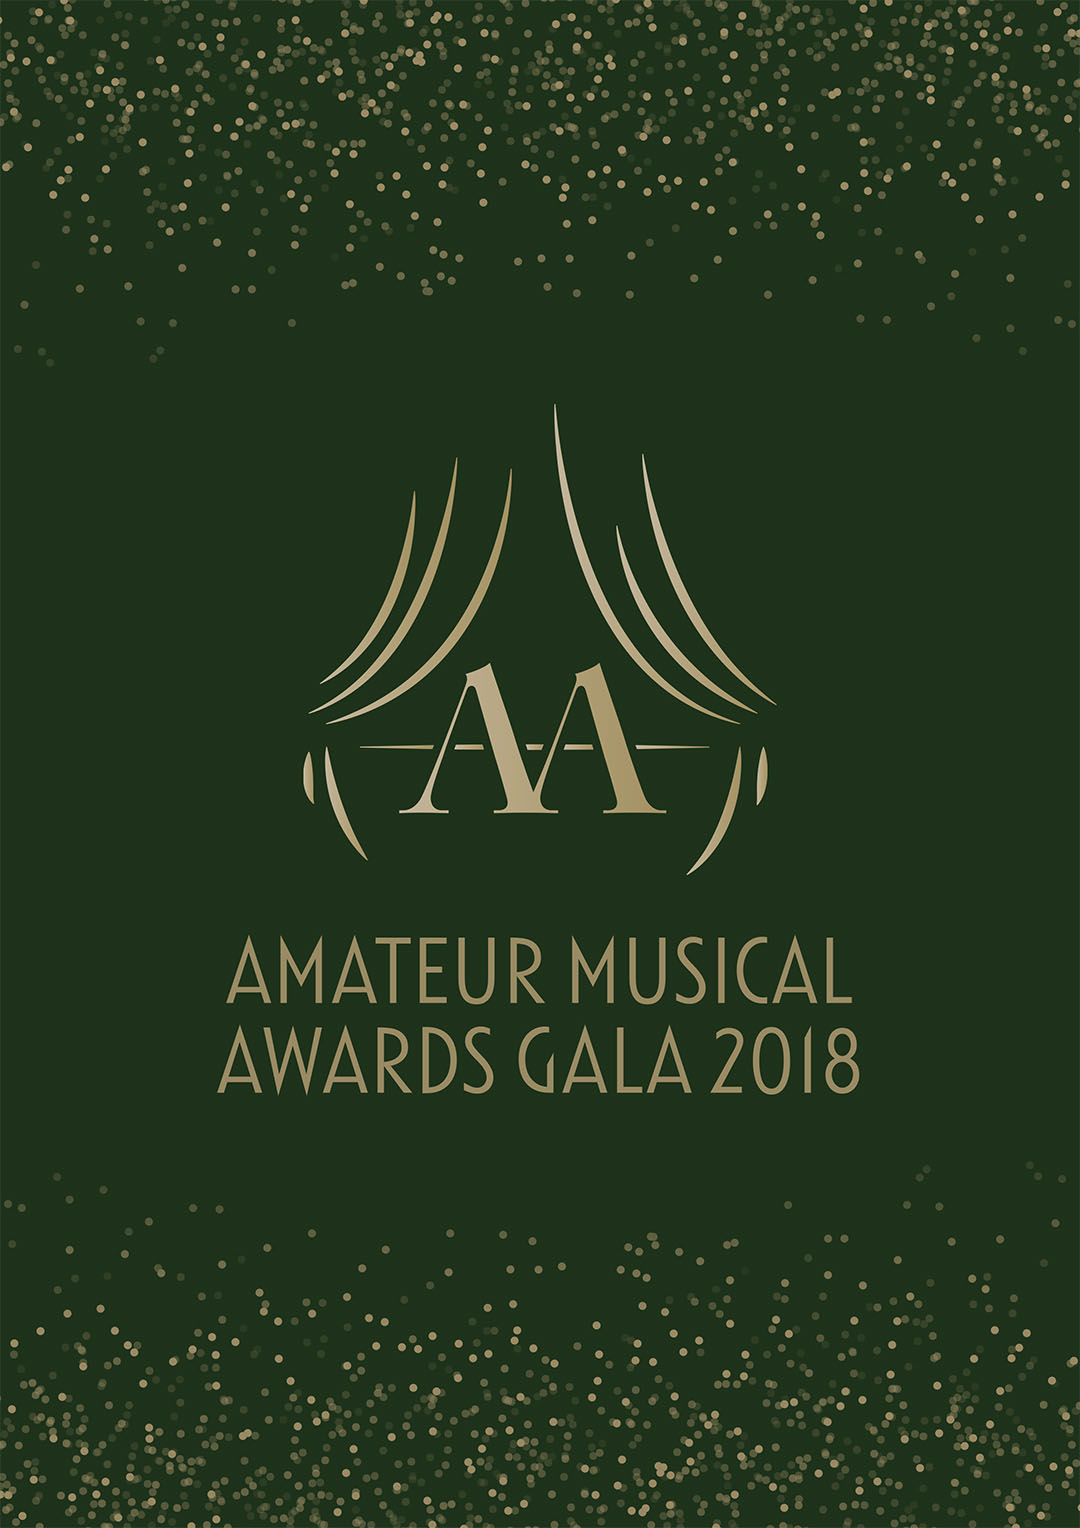 Amateur Musical Awards 2018 artwork